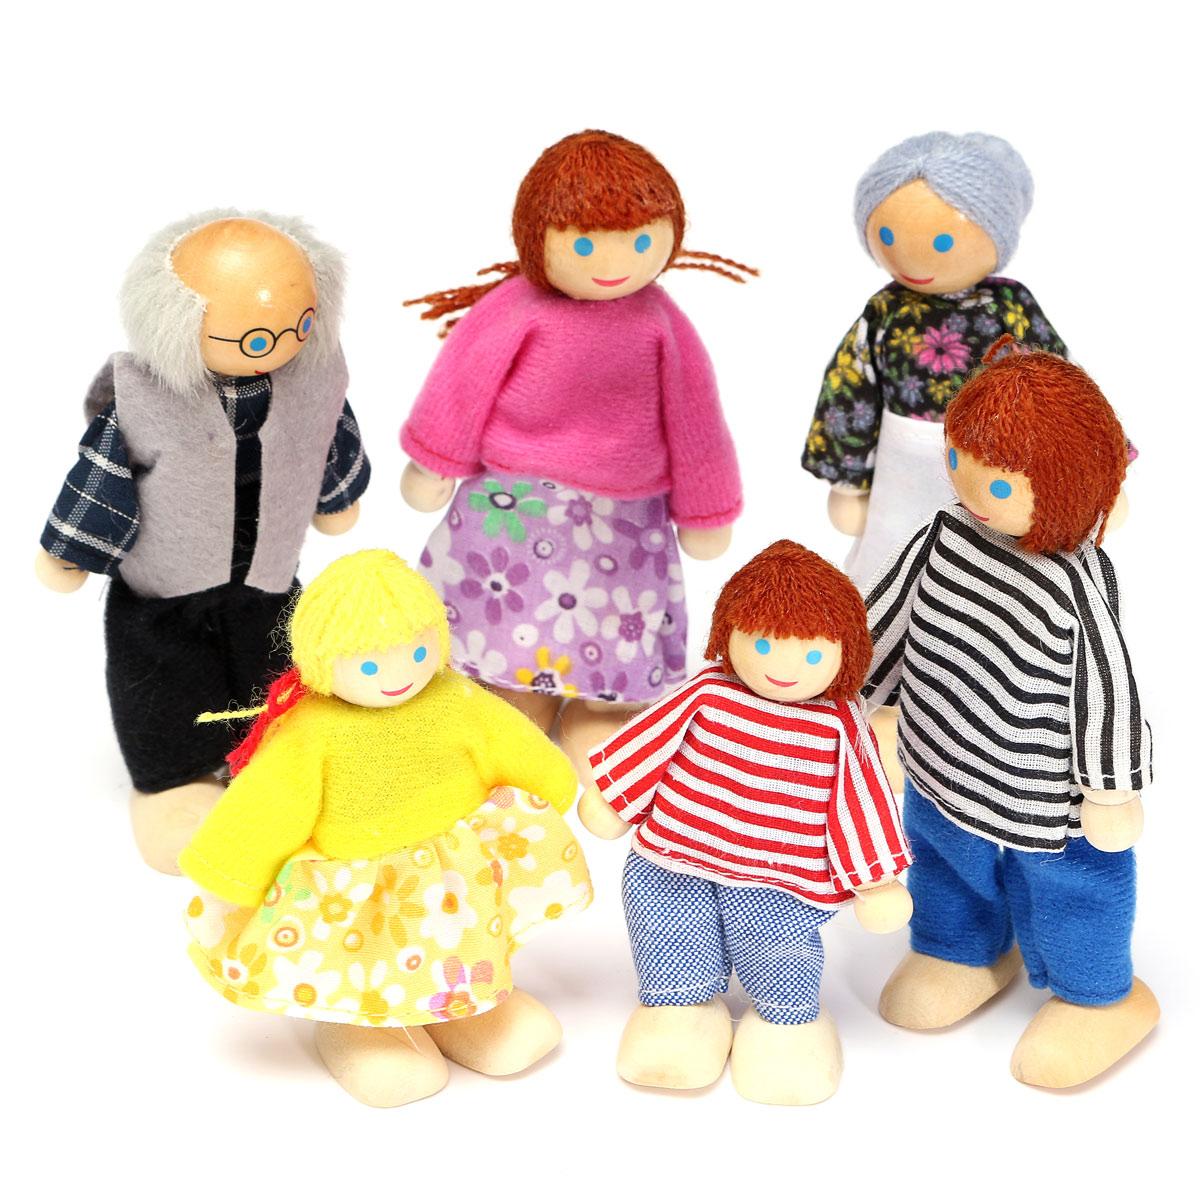 Kids Baby Educational Children Intellectual Wooden Toy Birthday ...